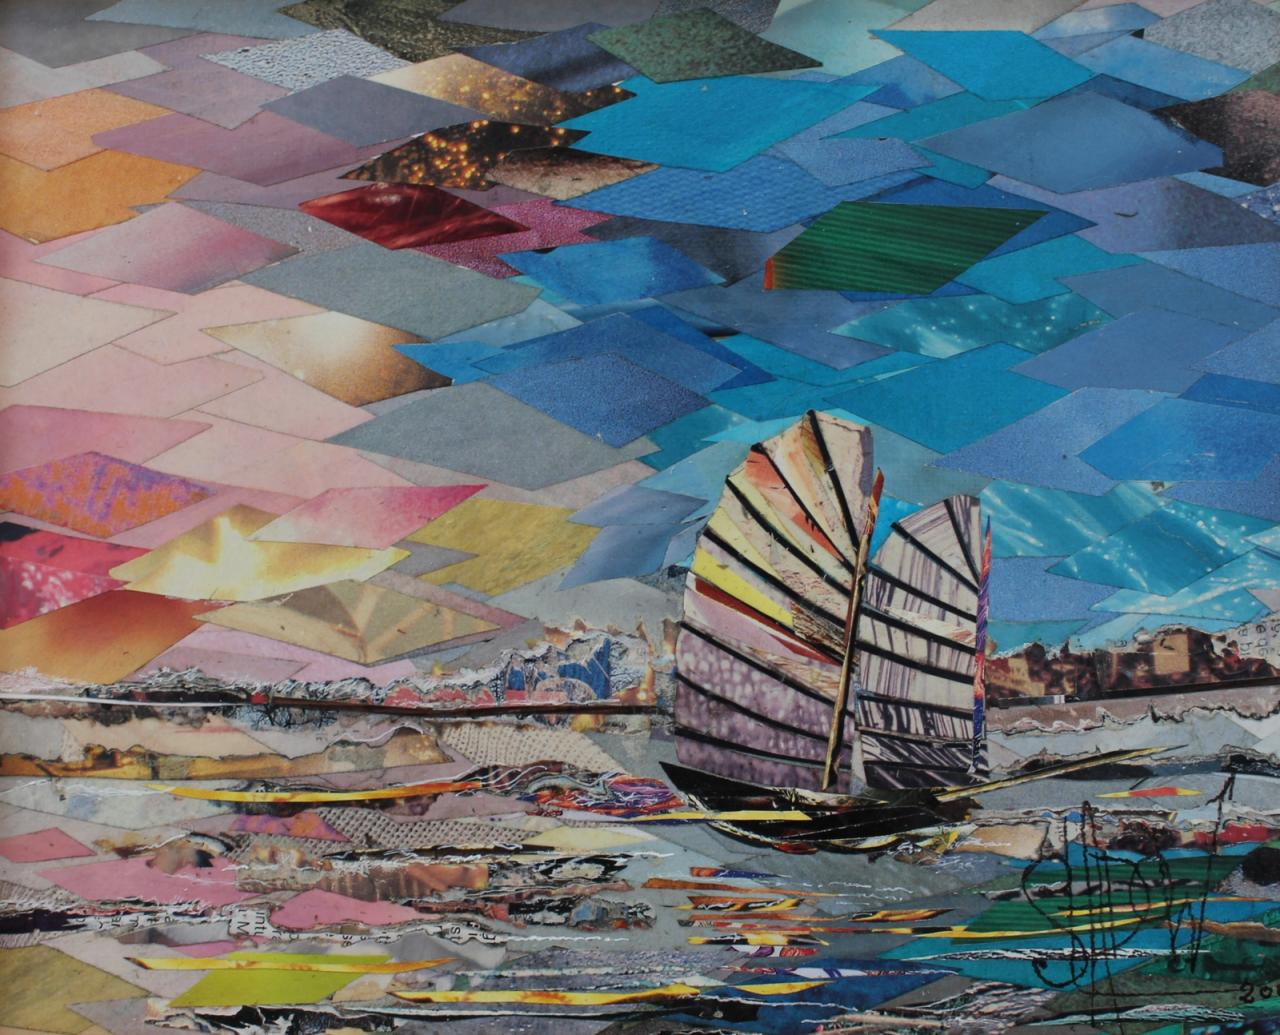 Samuel sladow collage collagiste peinture marine pablo for Braque peintre